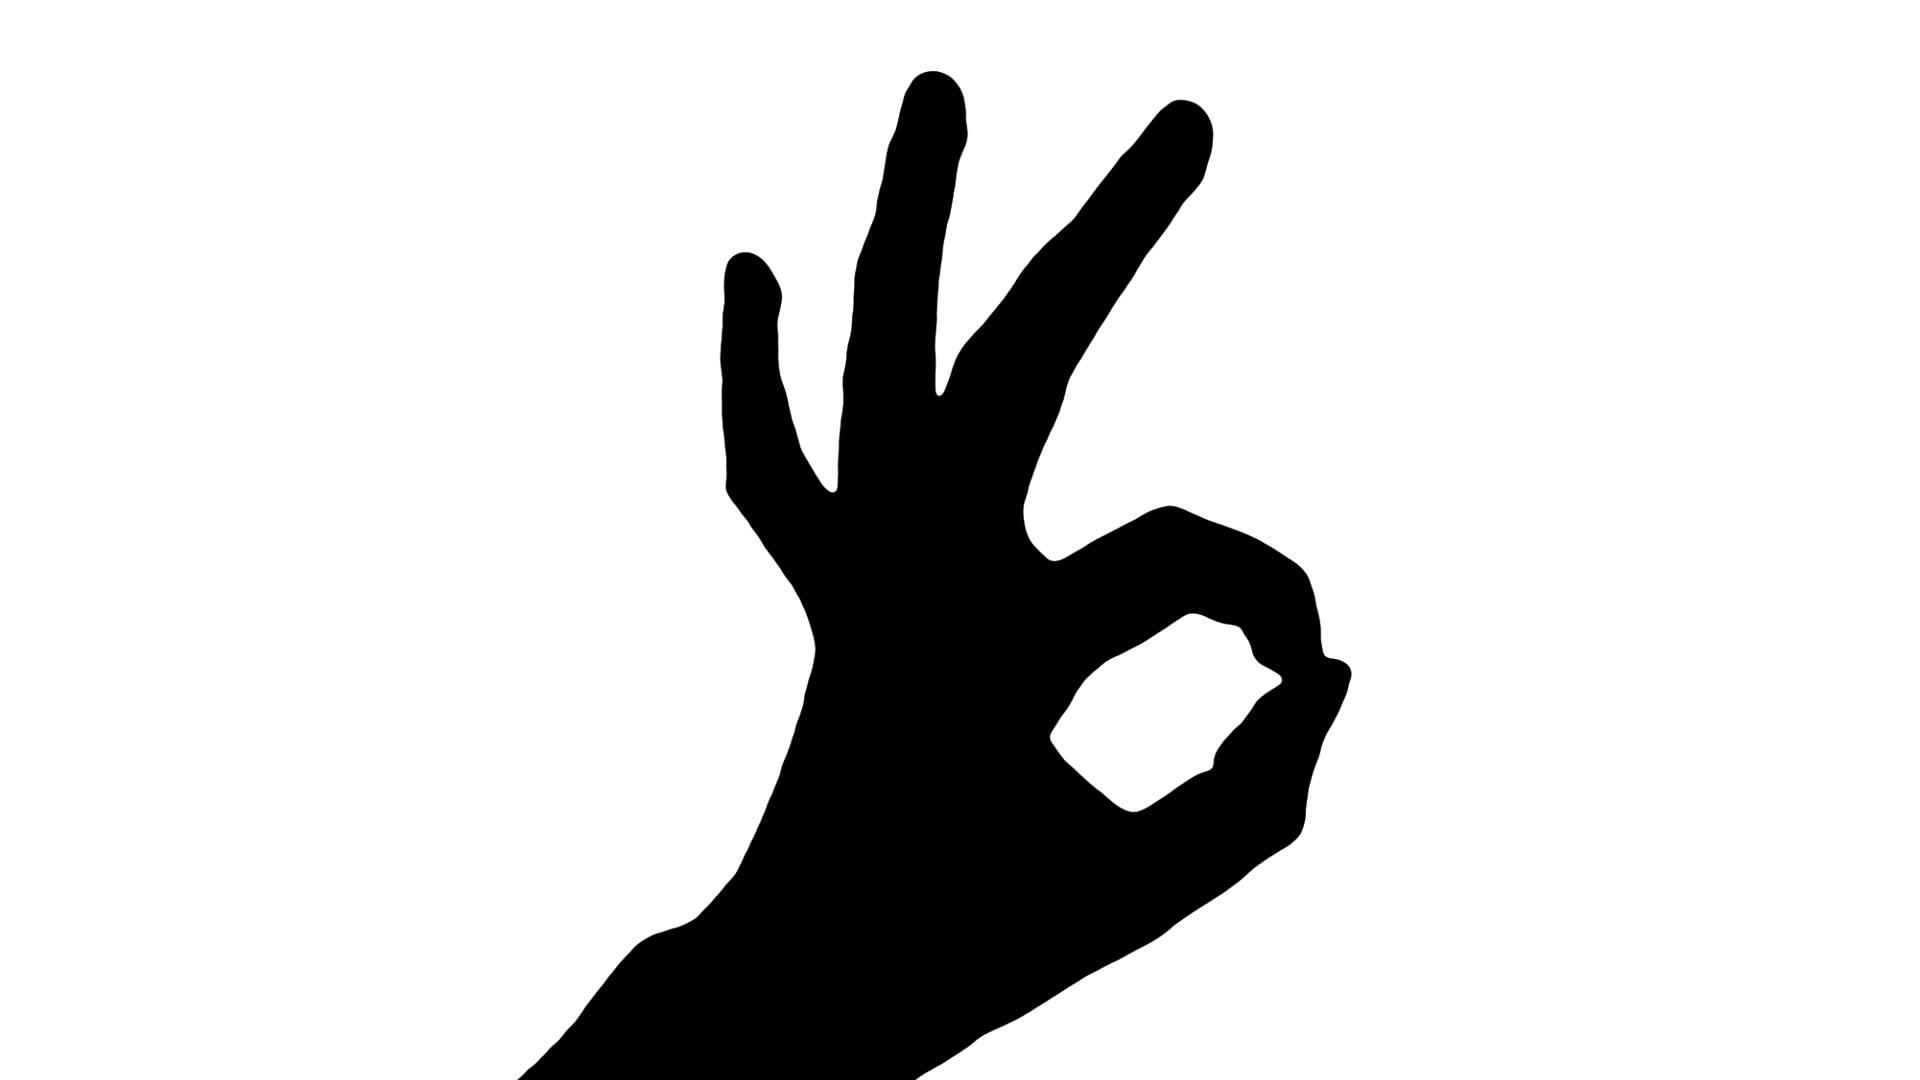 1920x1080 Ok Hand Sign Clipart